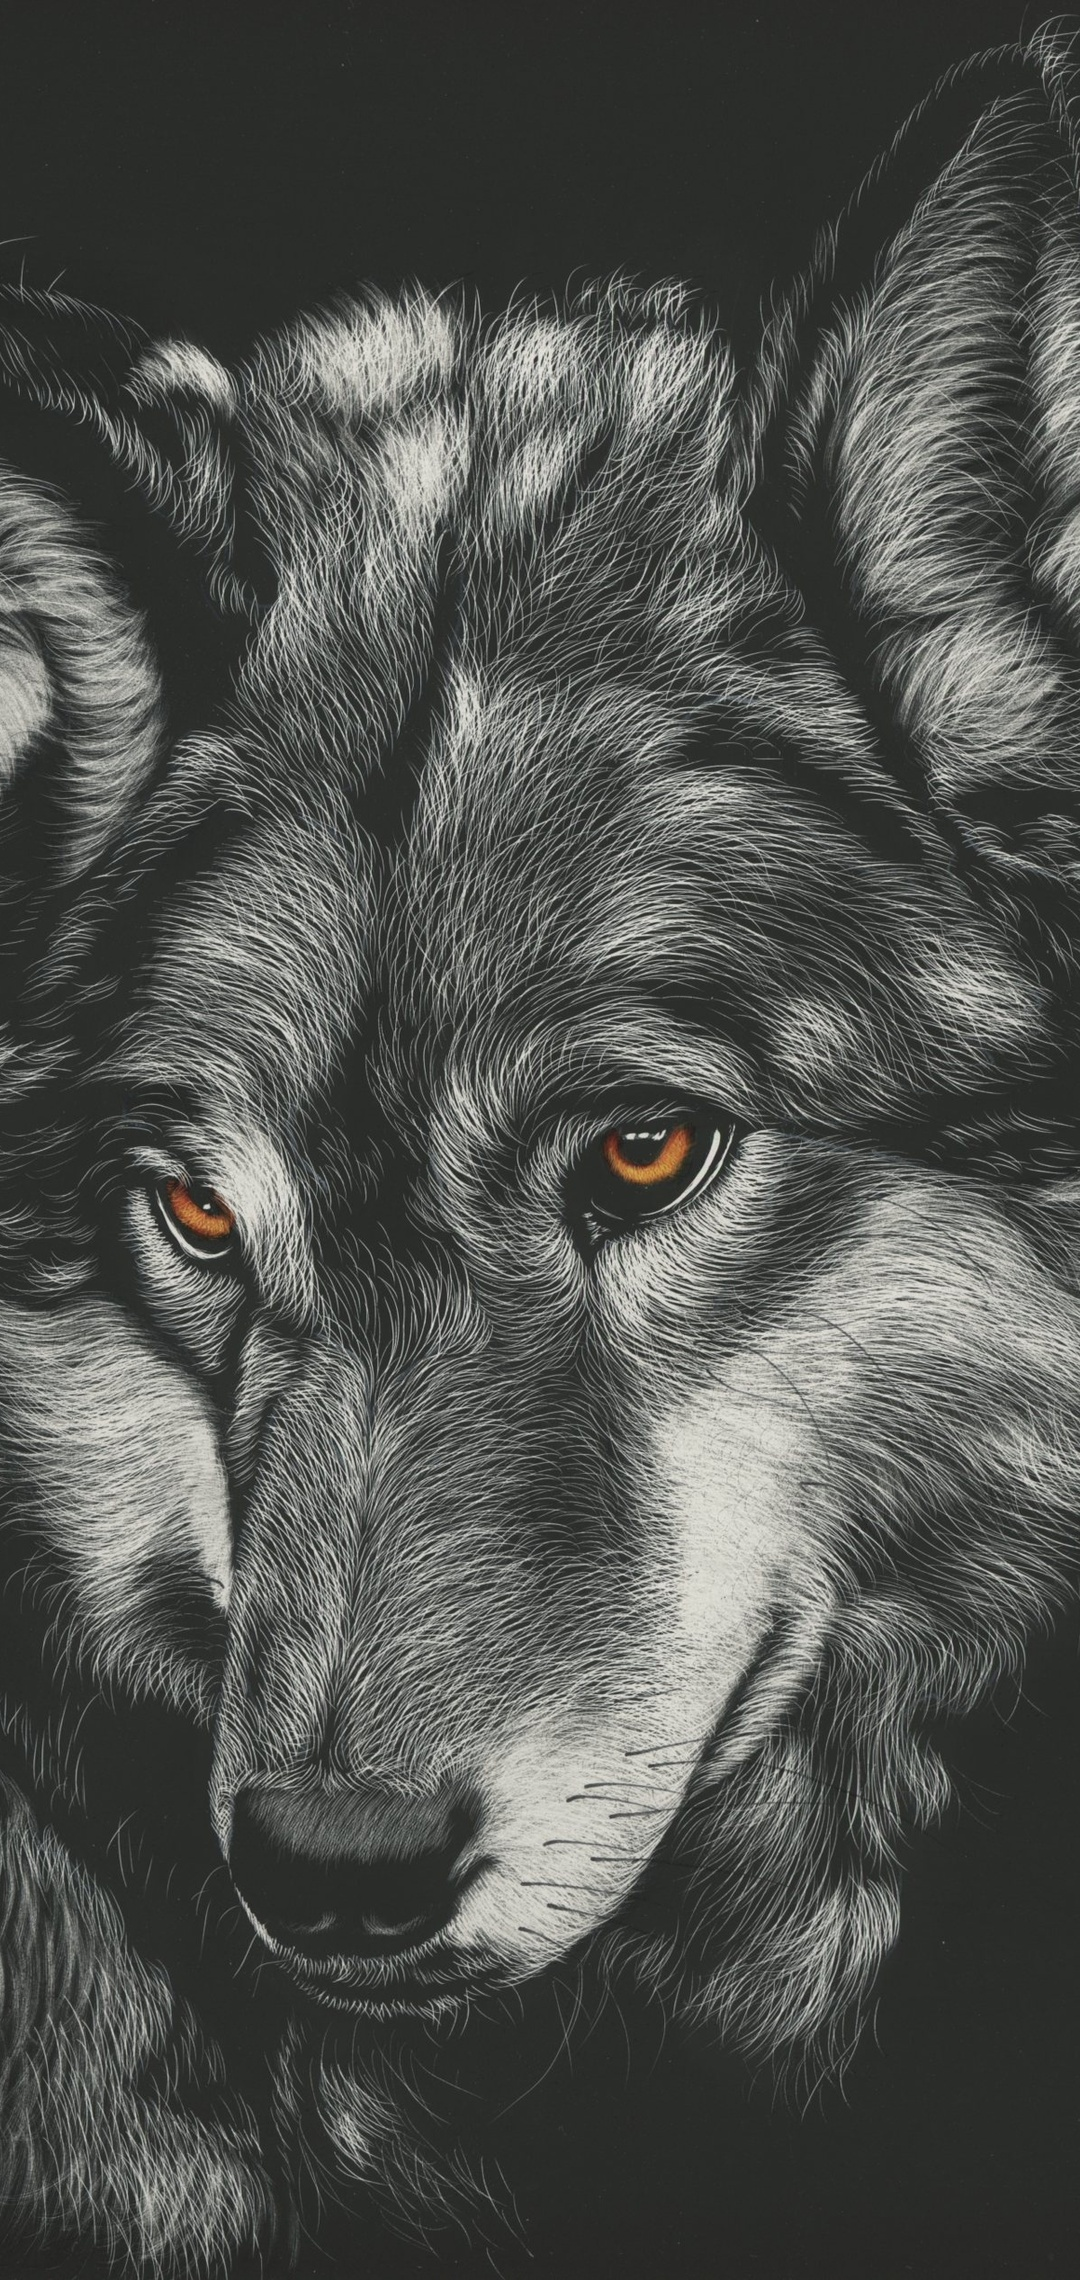 wolf-painting-4k-s9.jpg